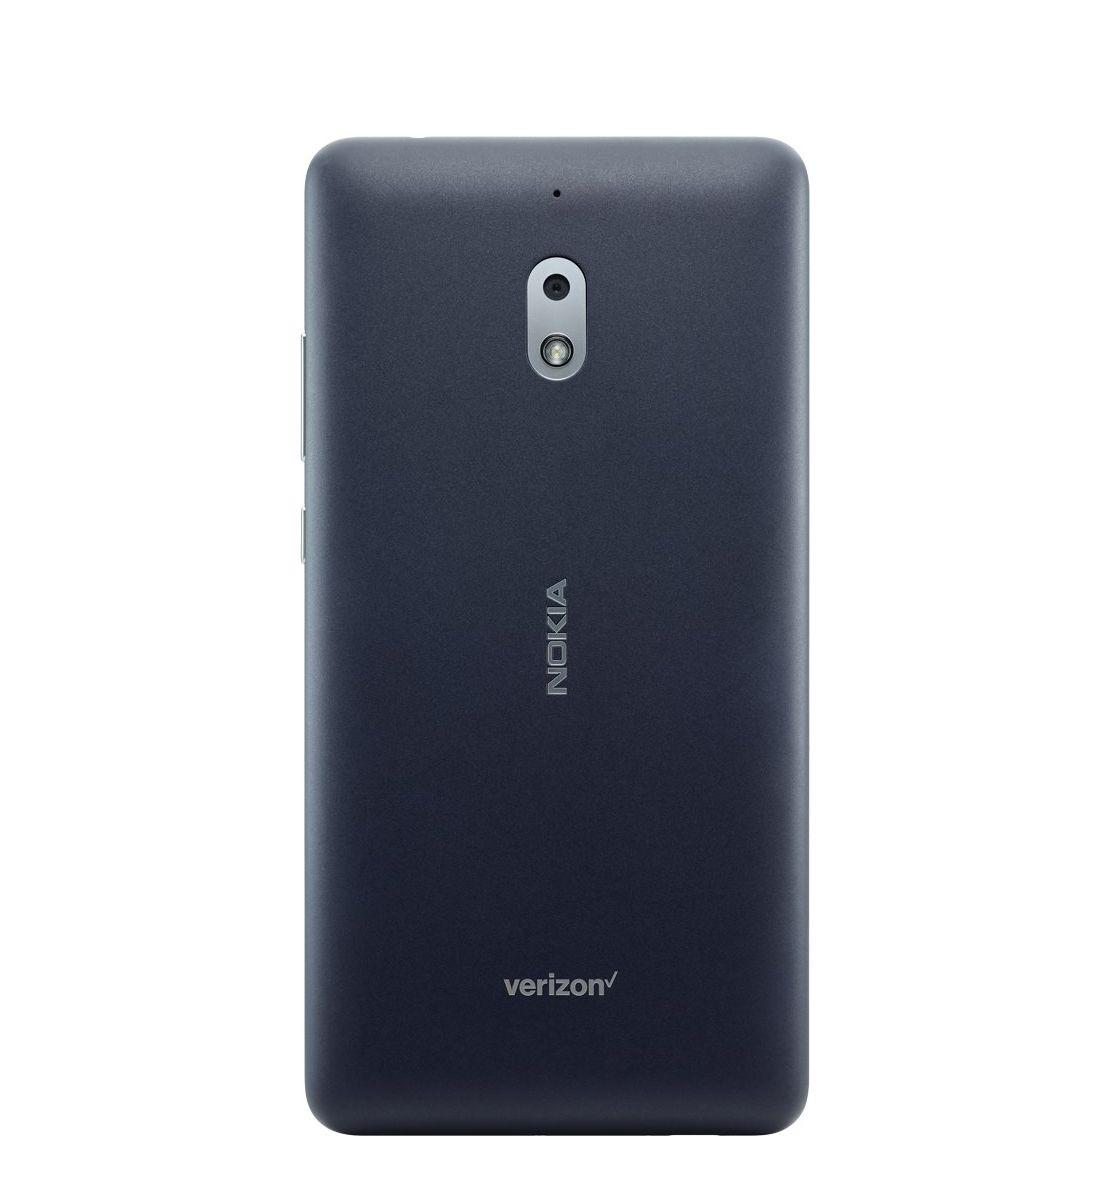 Leak shows a new Nokia phone returning to Verizon